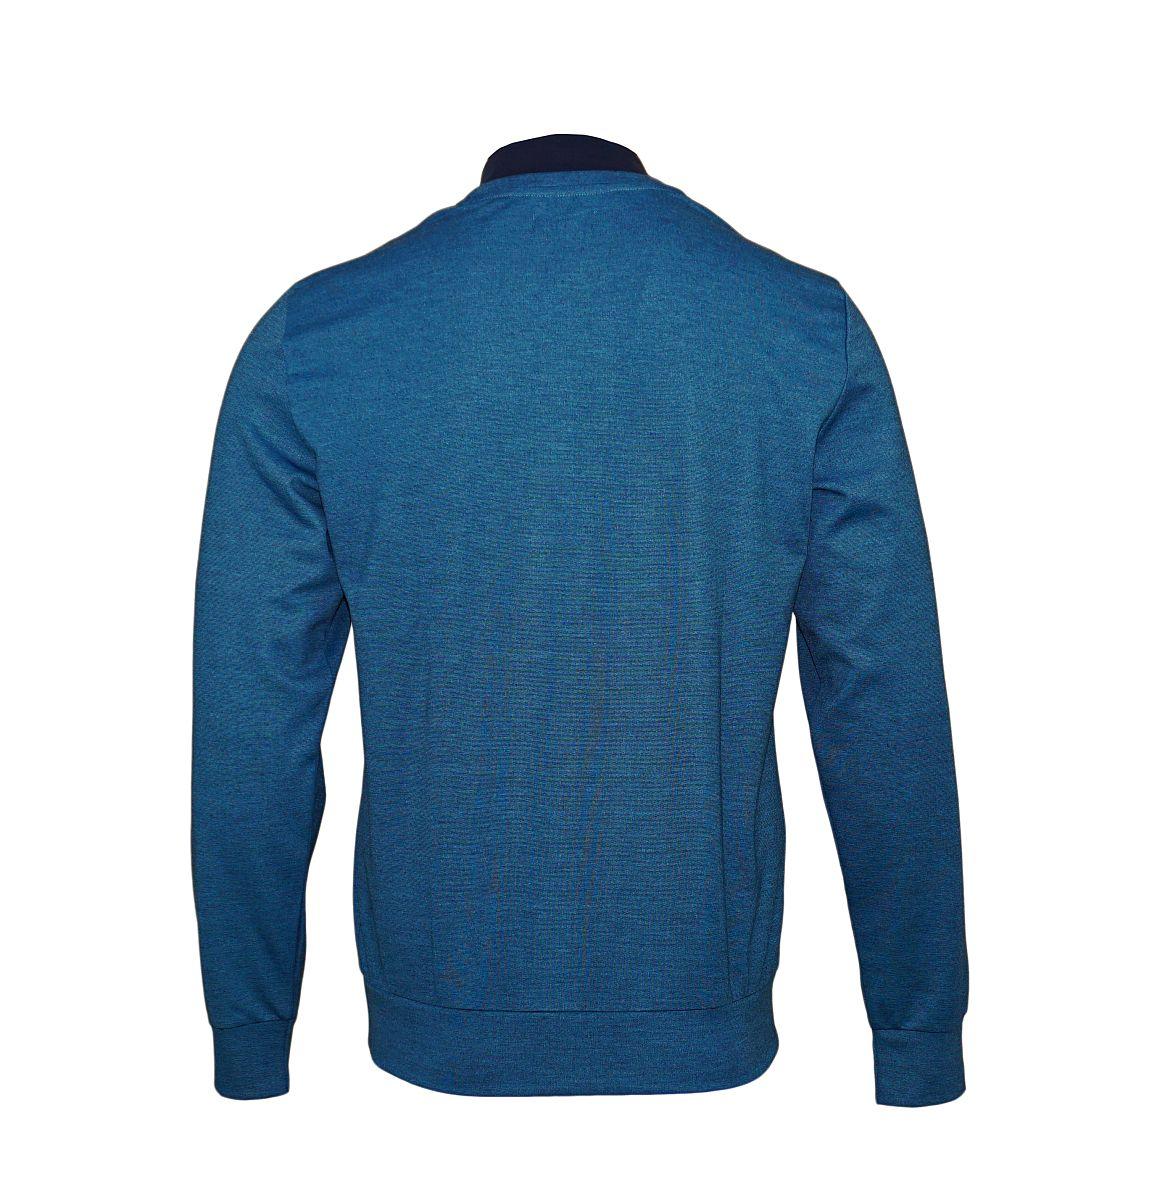 Emporio Armani Pullover Rundhals Sweater 111437 7A561 17132 BLU CAD/MARINE HW17-EAS1